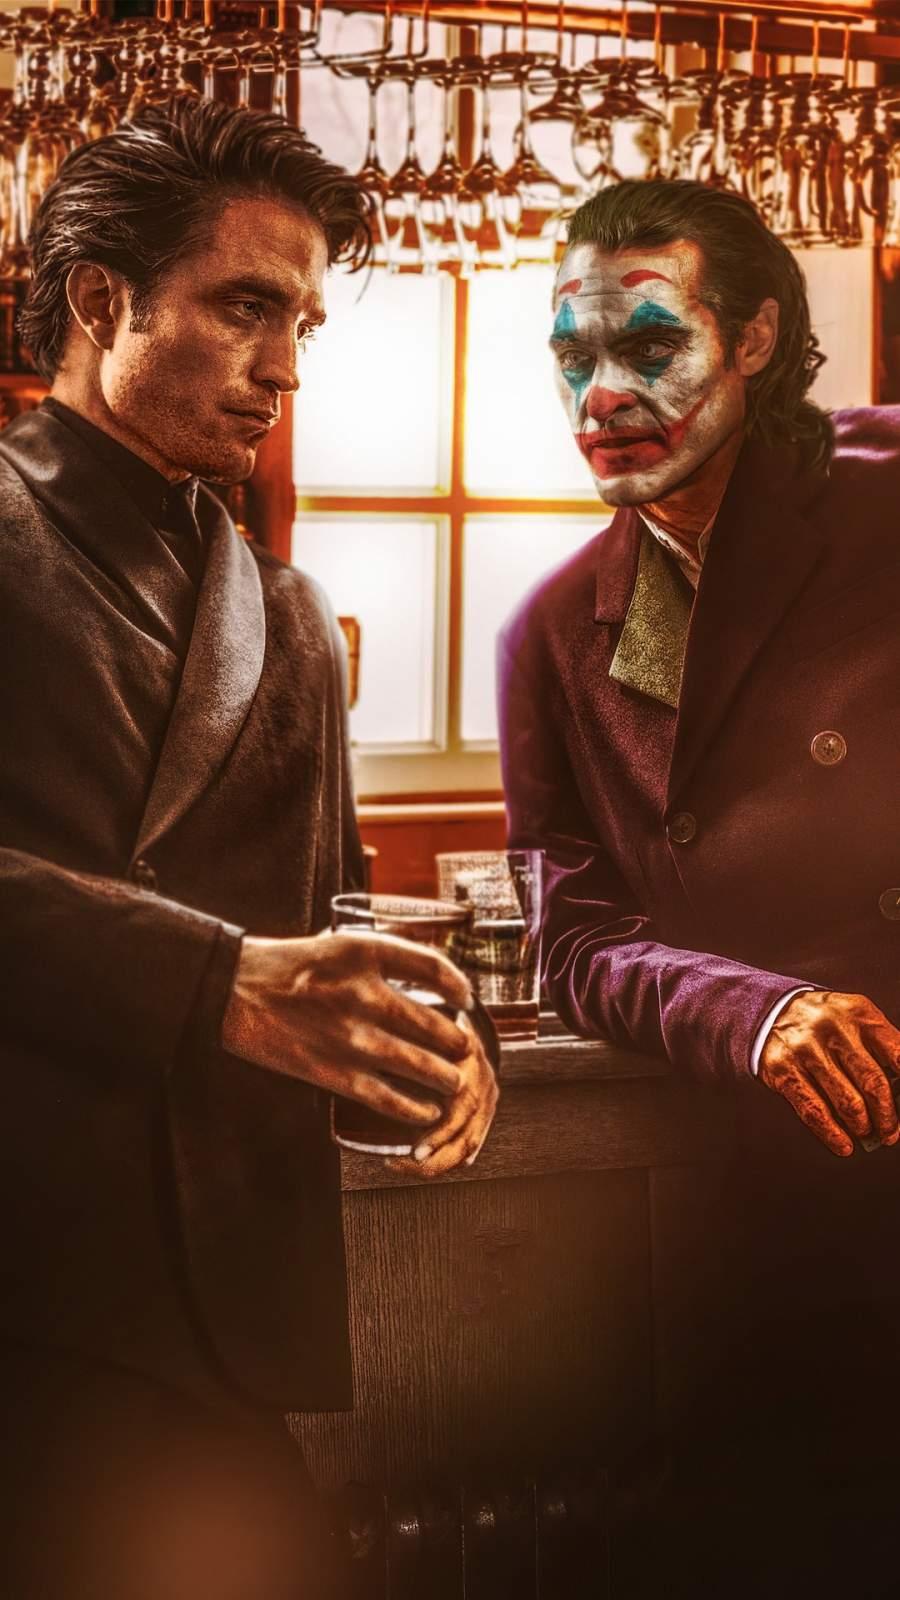 Robert Pattison and Joker Joaquin Phoenix iPhone Wallpaper